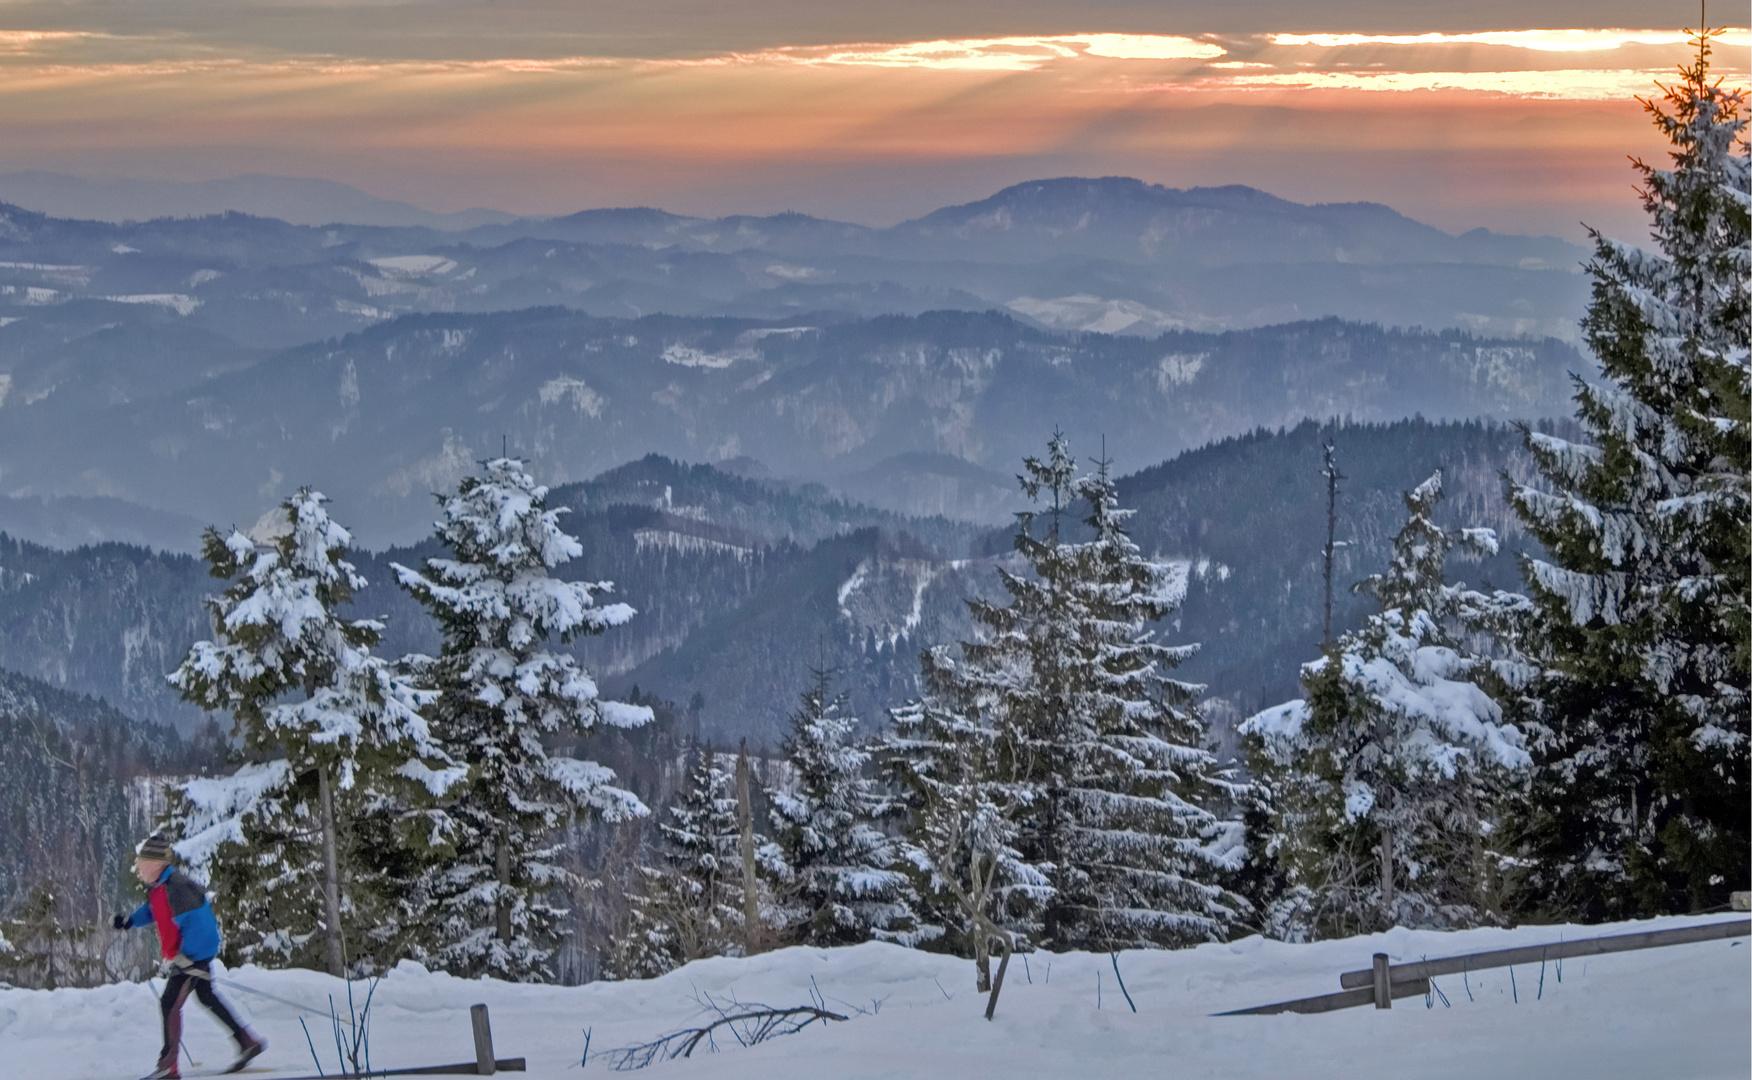 Skilangläufer im Nordschwarzwald